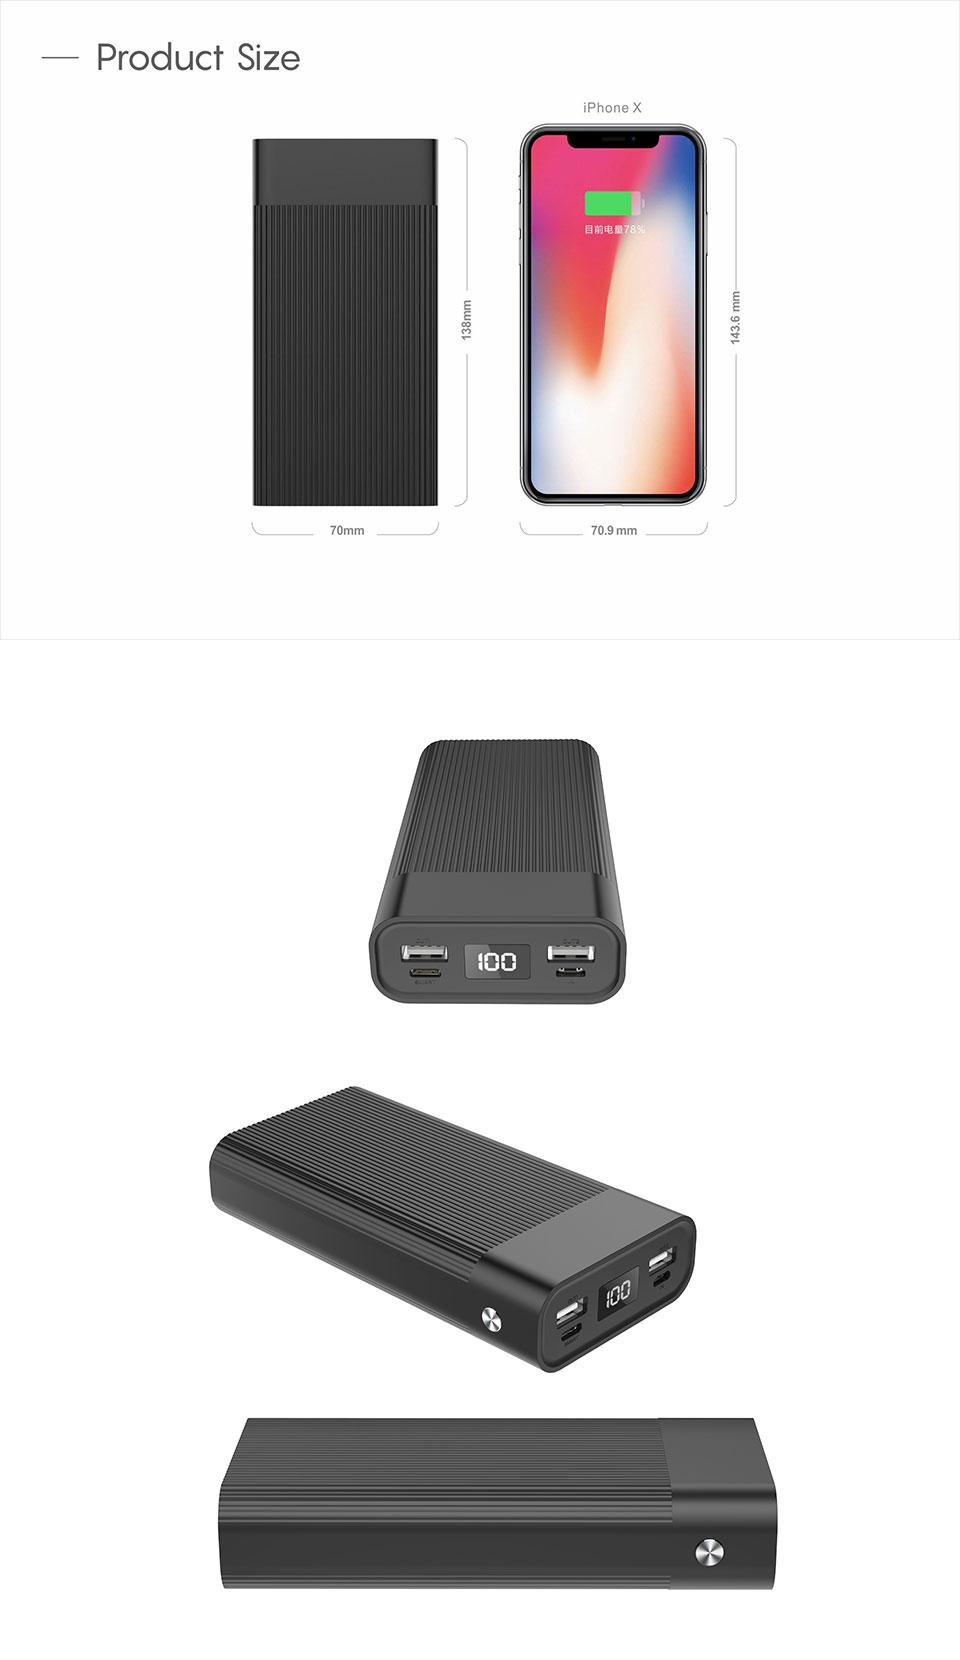 XiPin PX301 Dual Input Power Bank 10,000mAh product